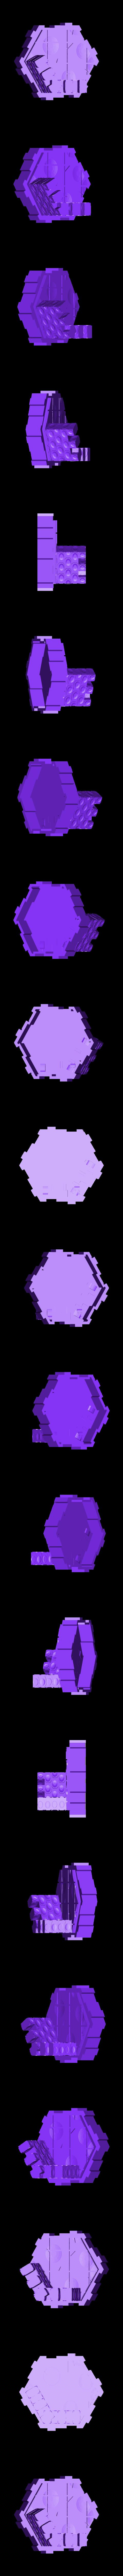 1hex_stone_with_wall.stl Download free STL file Locking Hex Terrain Stone Path • 3D print object, mrhers2